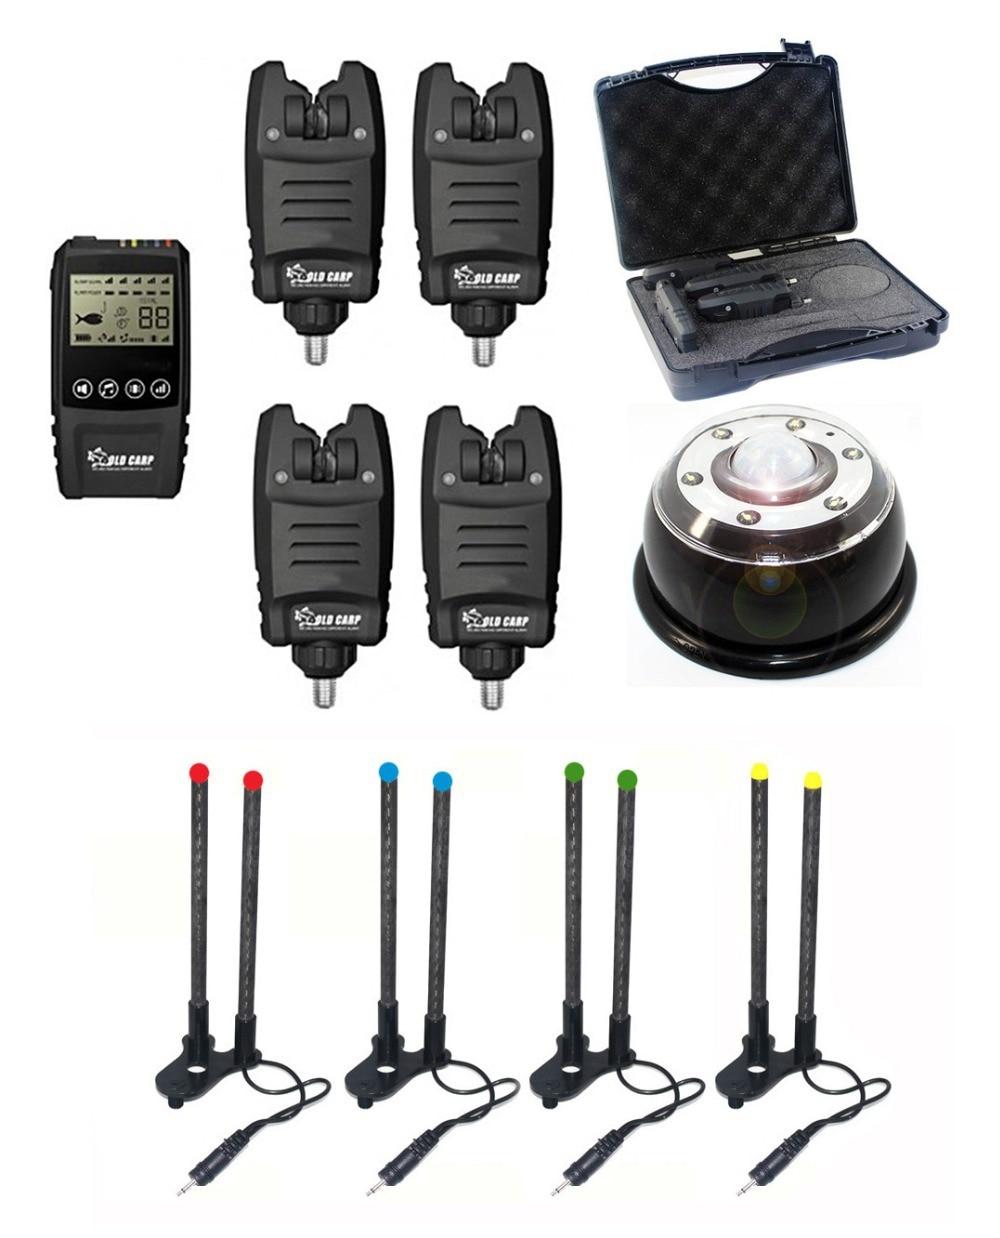 OLD CARP 1+4 Galaxy BL Multi-LED Wireless Fishing Rod Bite Alarm with Snag ears and Tent Light for carp fishing заклепочник усиленный gross 40409